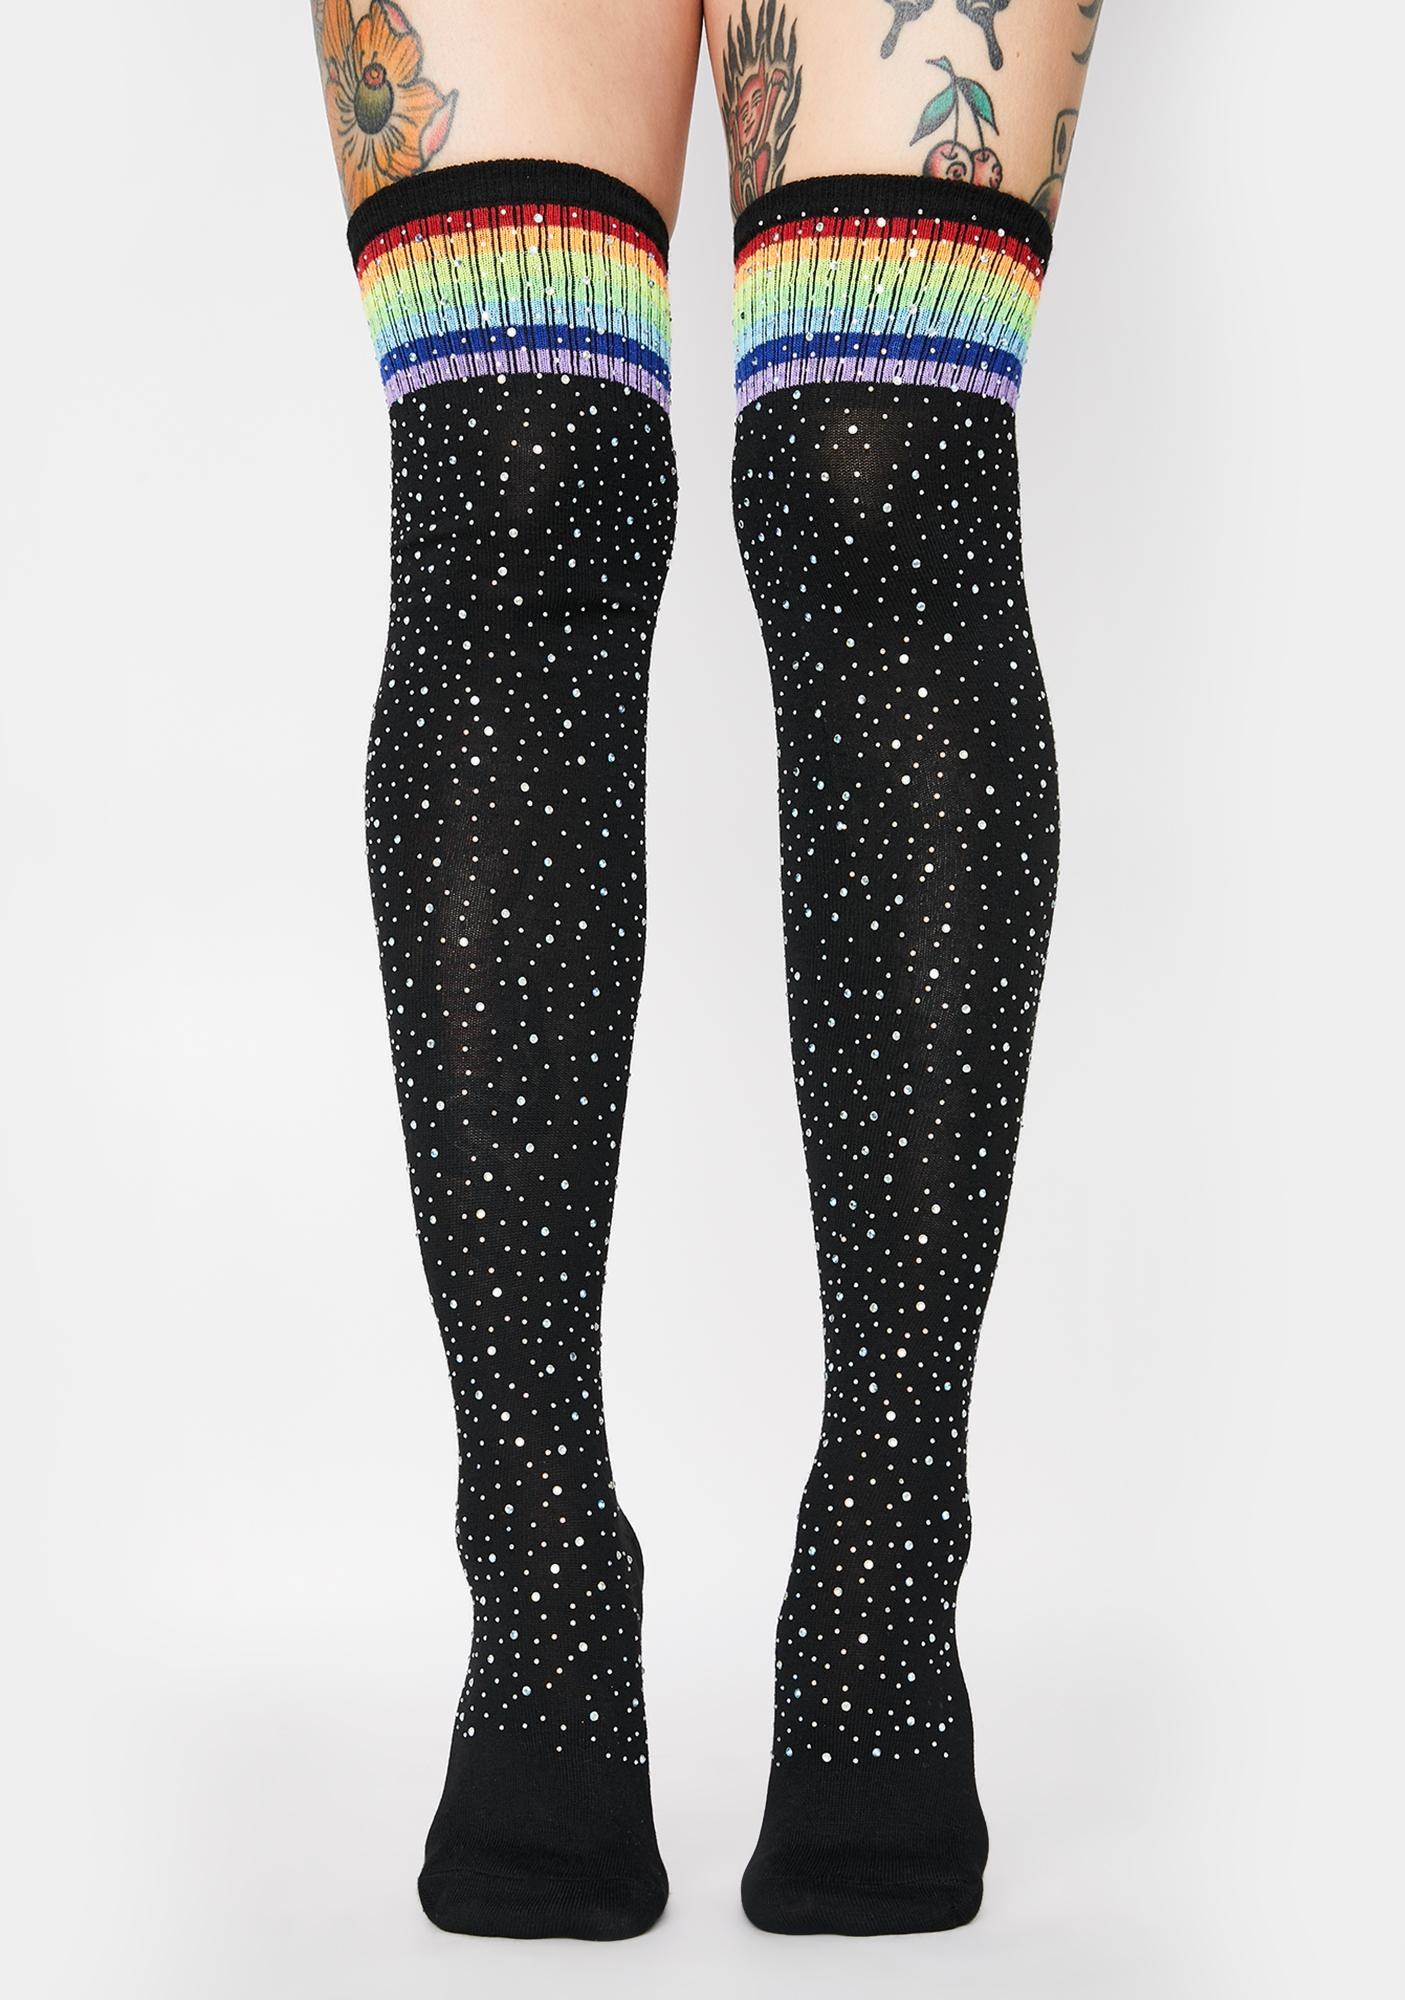 Cosmic Rivals Thigh High Socks